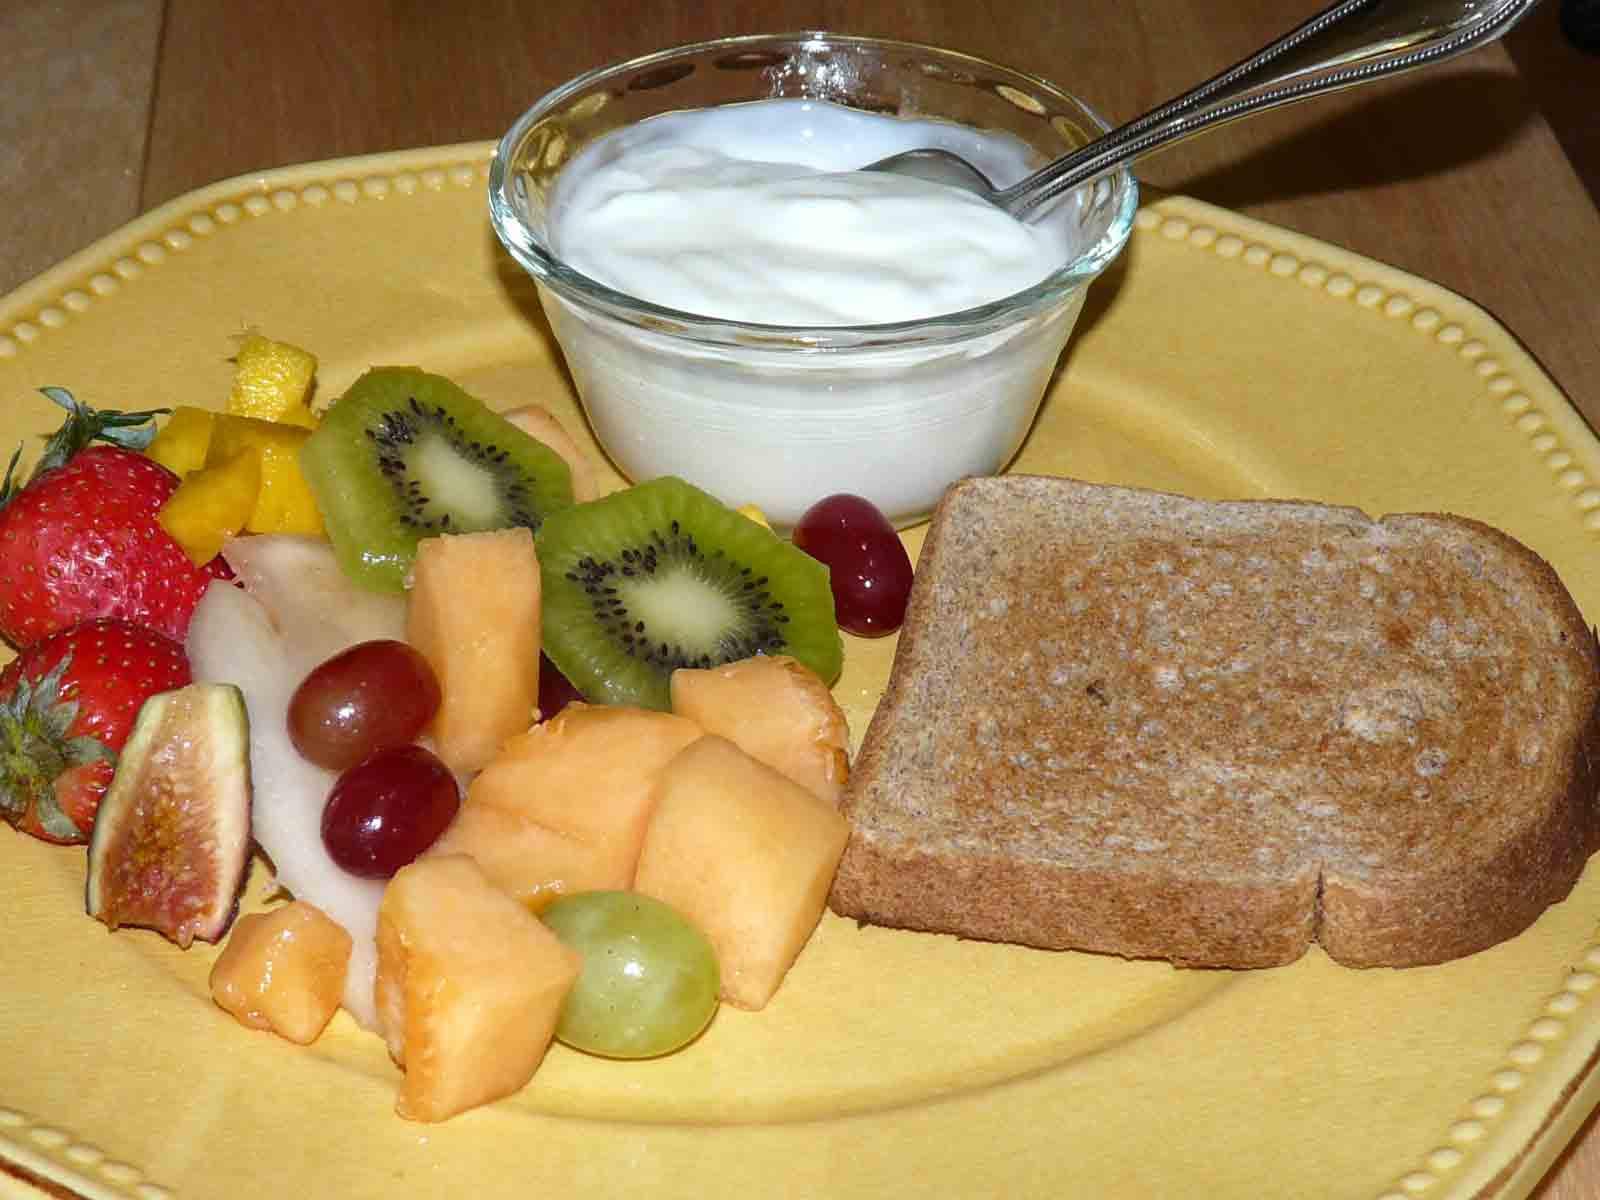 Healthy Breakfast Food  Food and Health munications